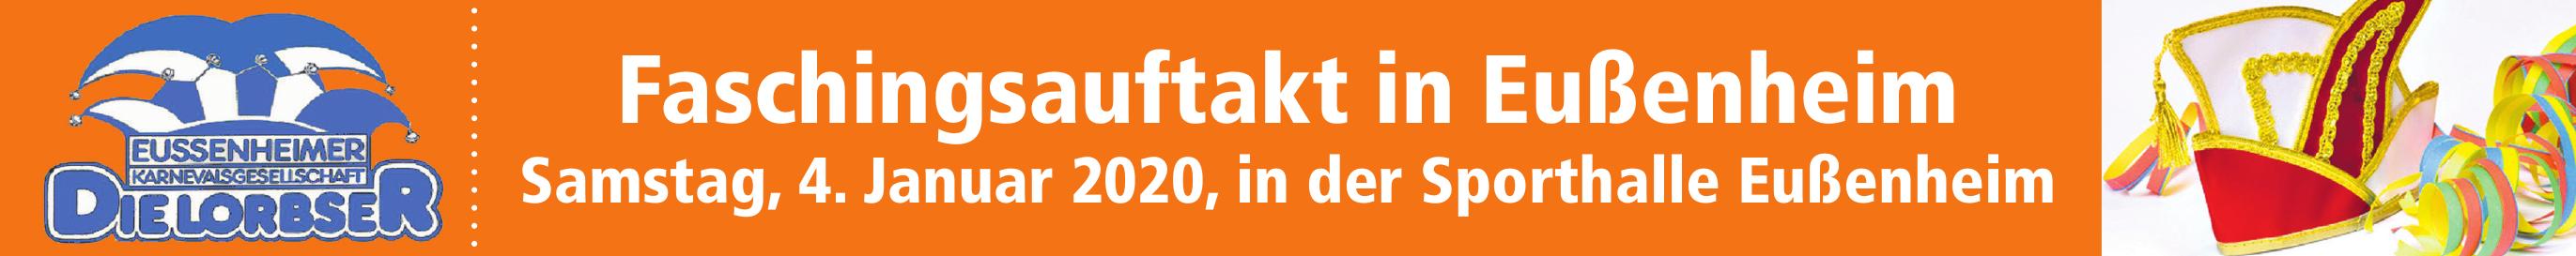 Faschingsauftakt in Eußenheim Image 1